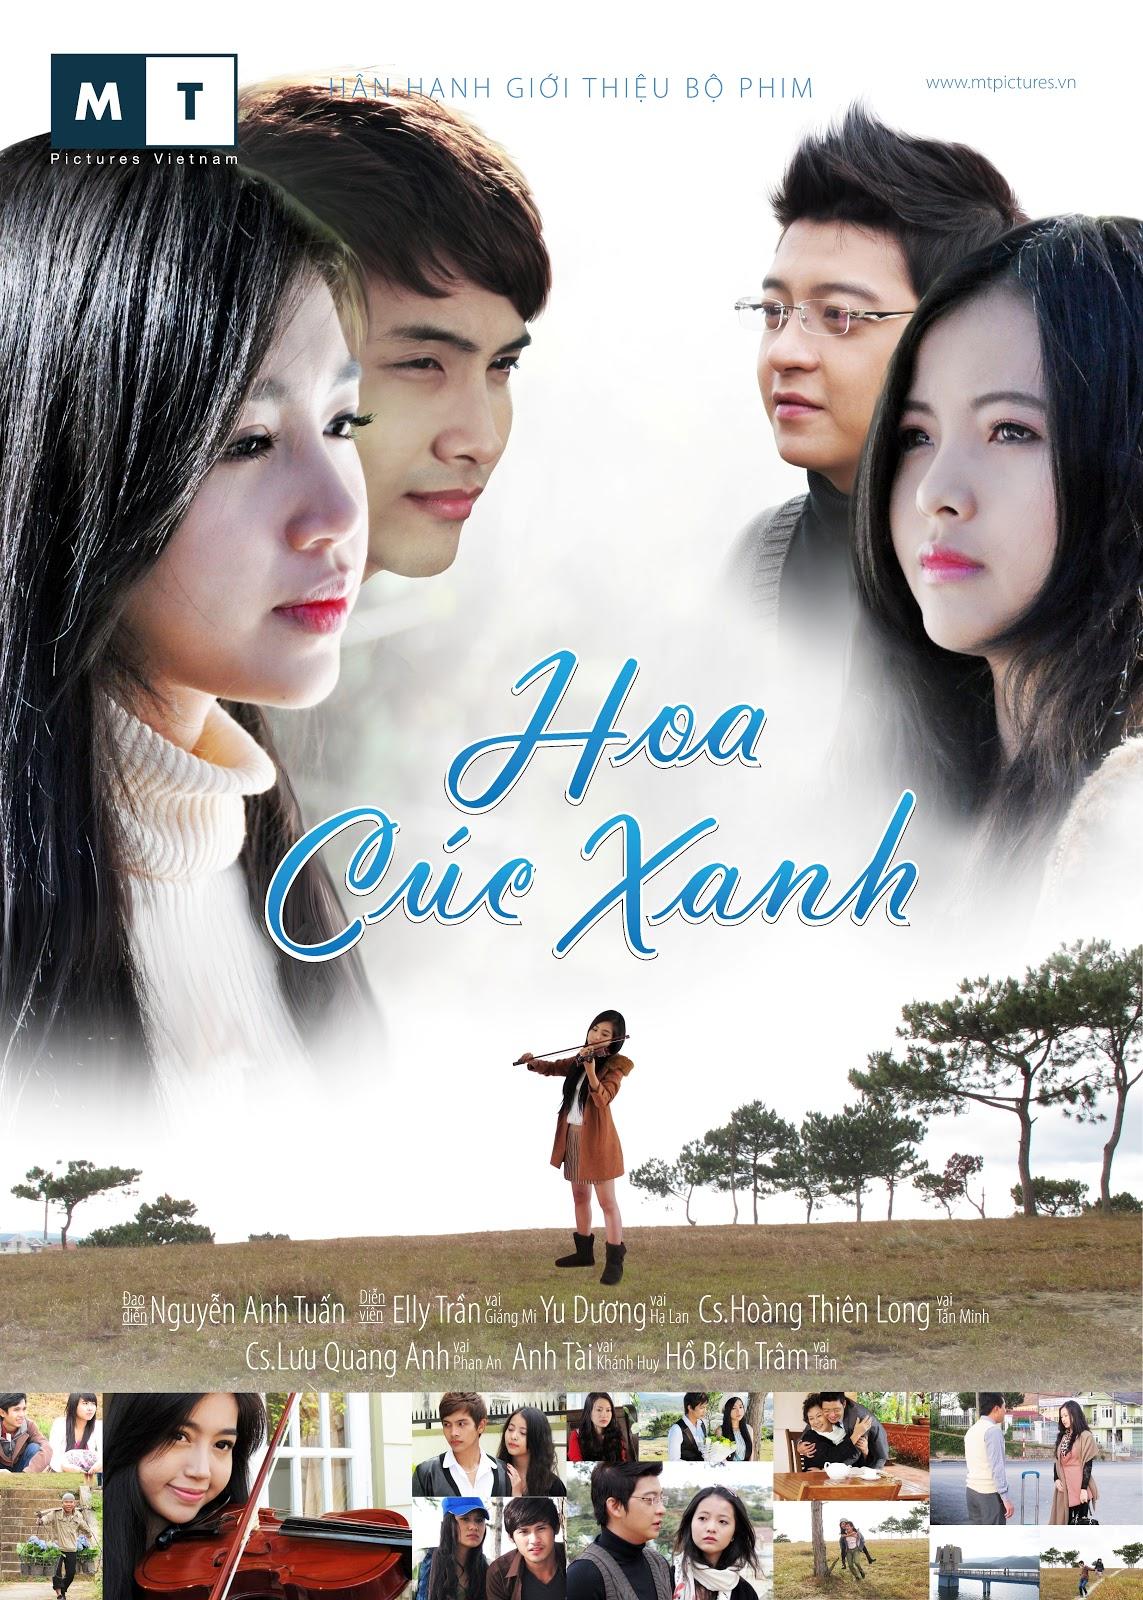 Hoa Cúc Xanh HTV7